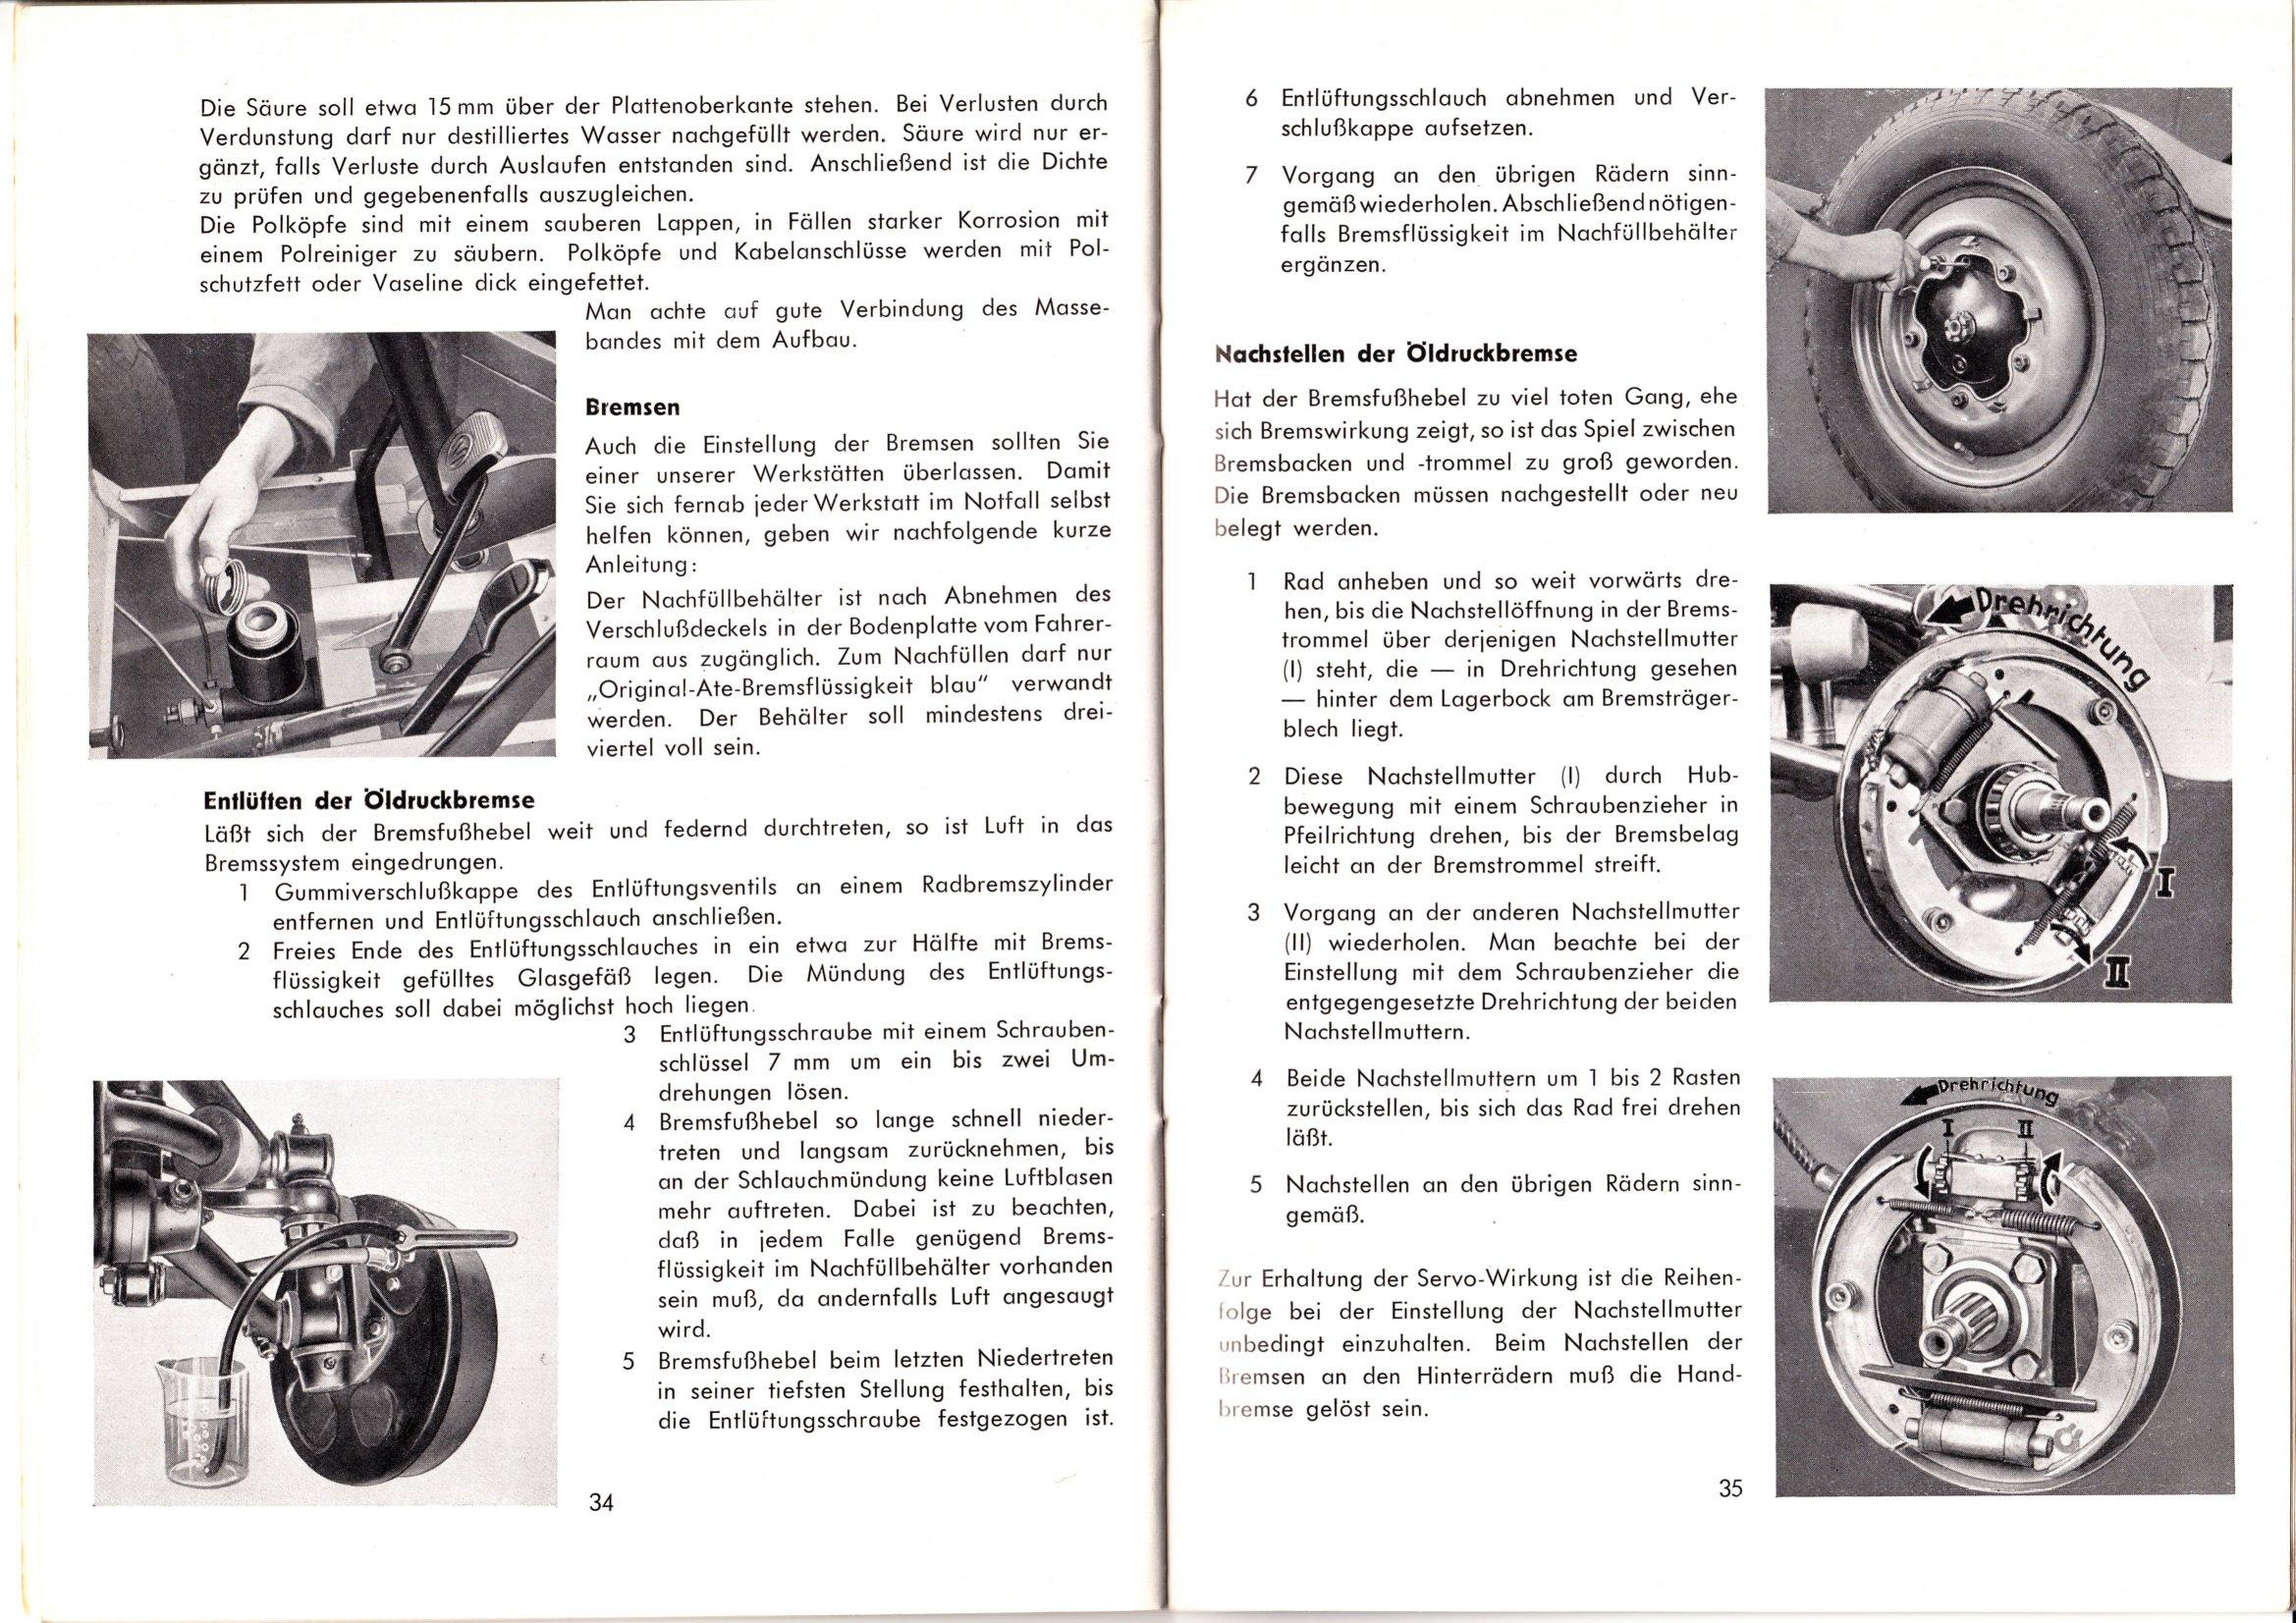 TheSamba.com :: February, 1950 VW Bus Owner\'s Manual - German